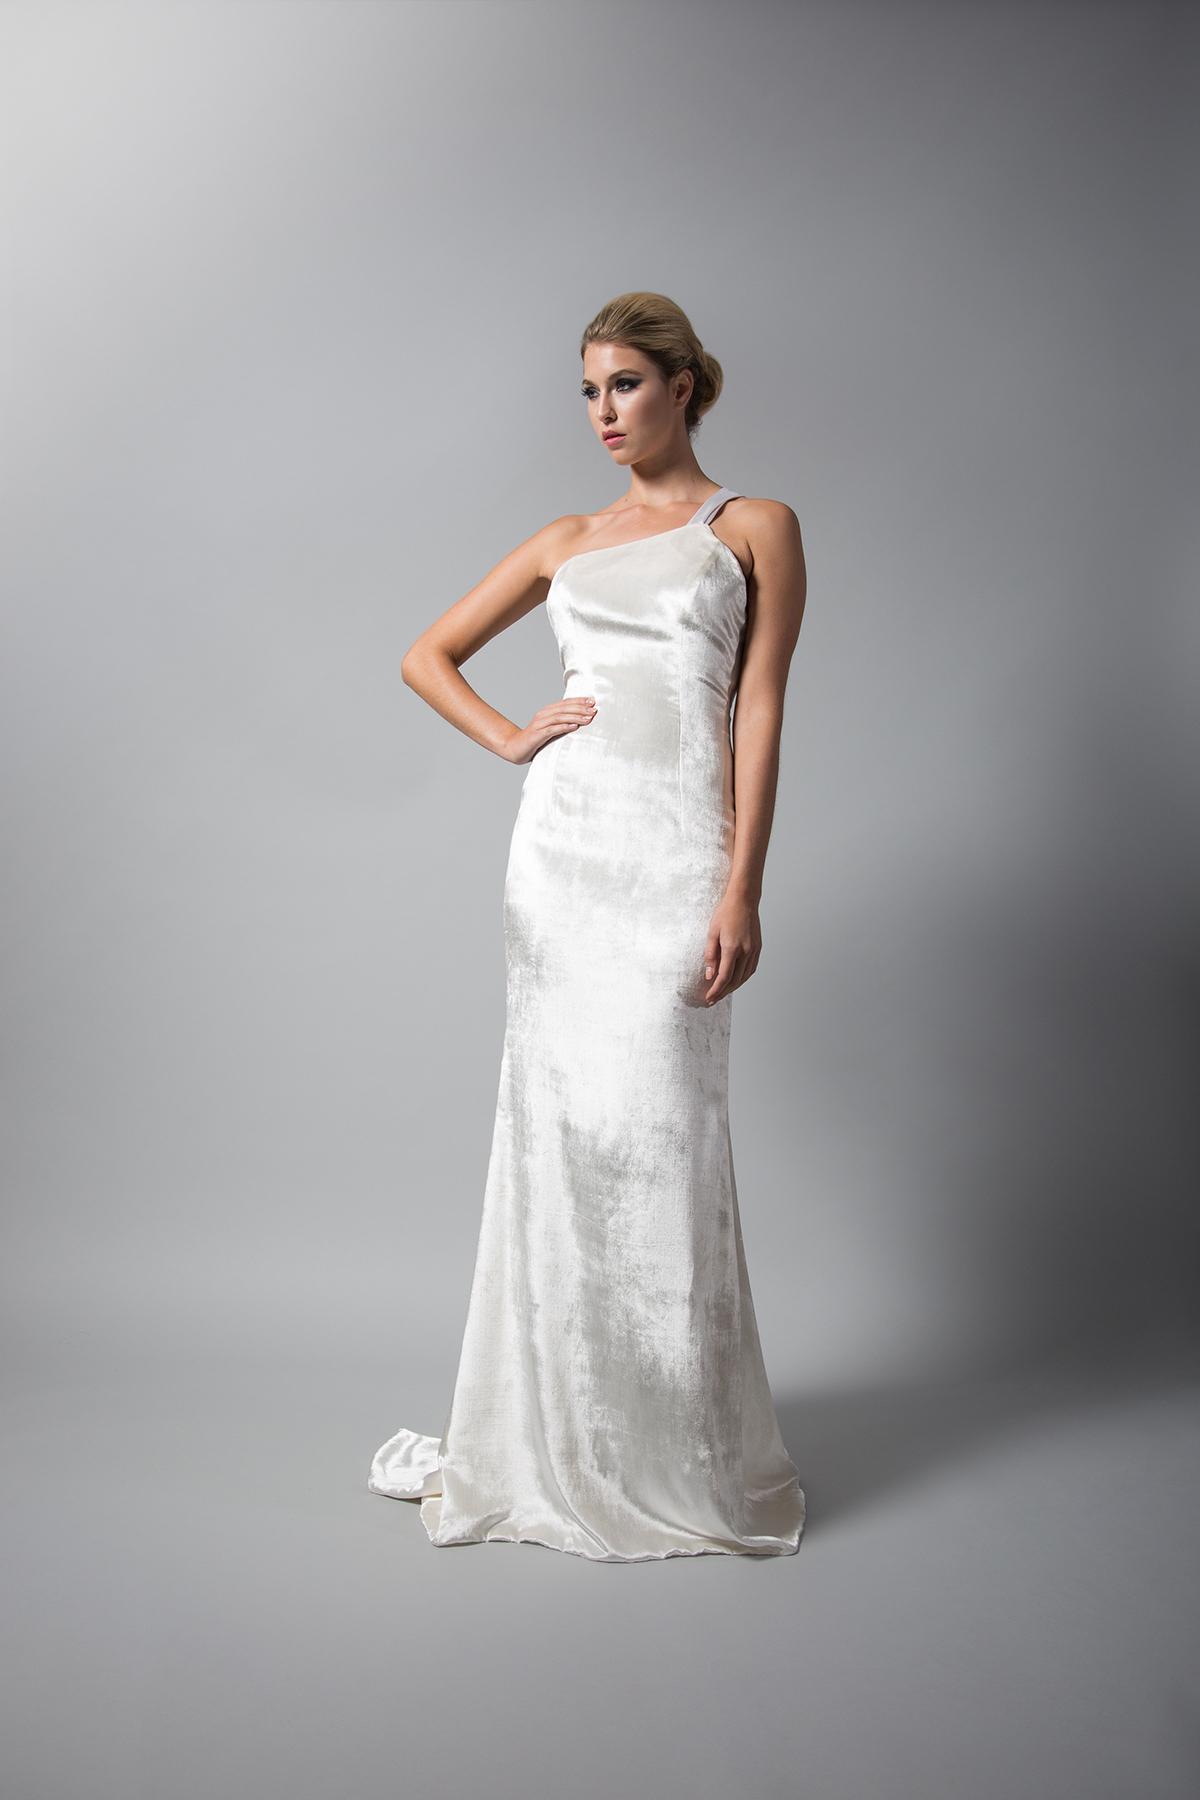 Randi Rahm: Style-Beau-Velvet-Gown